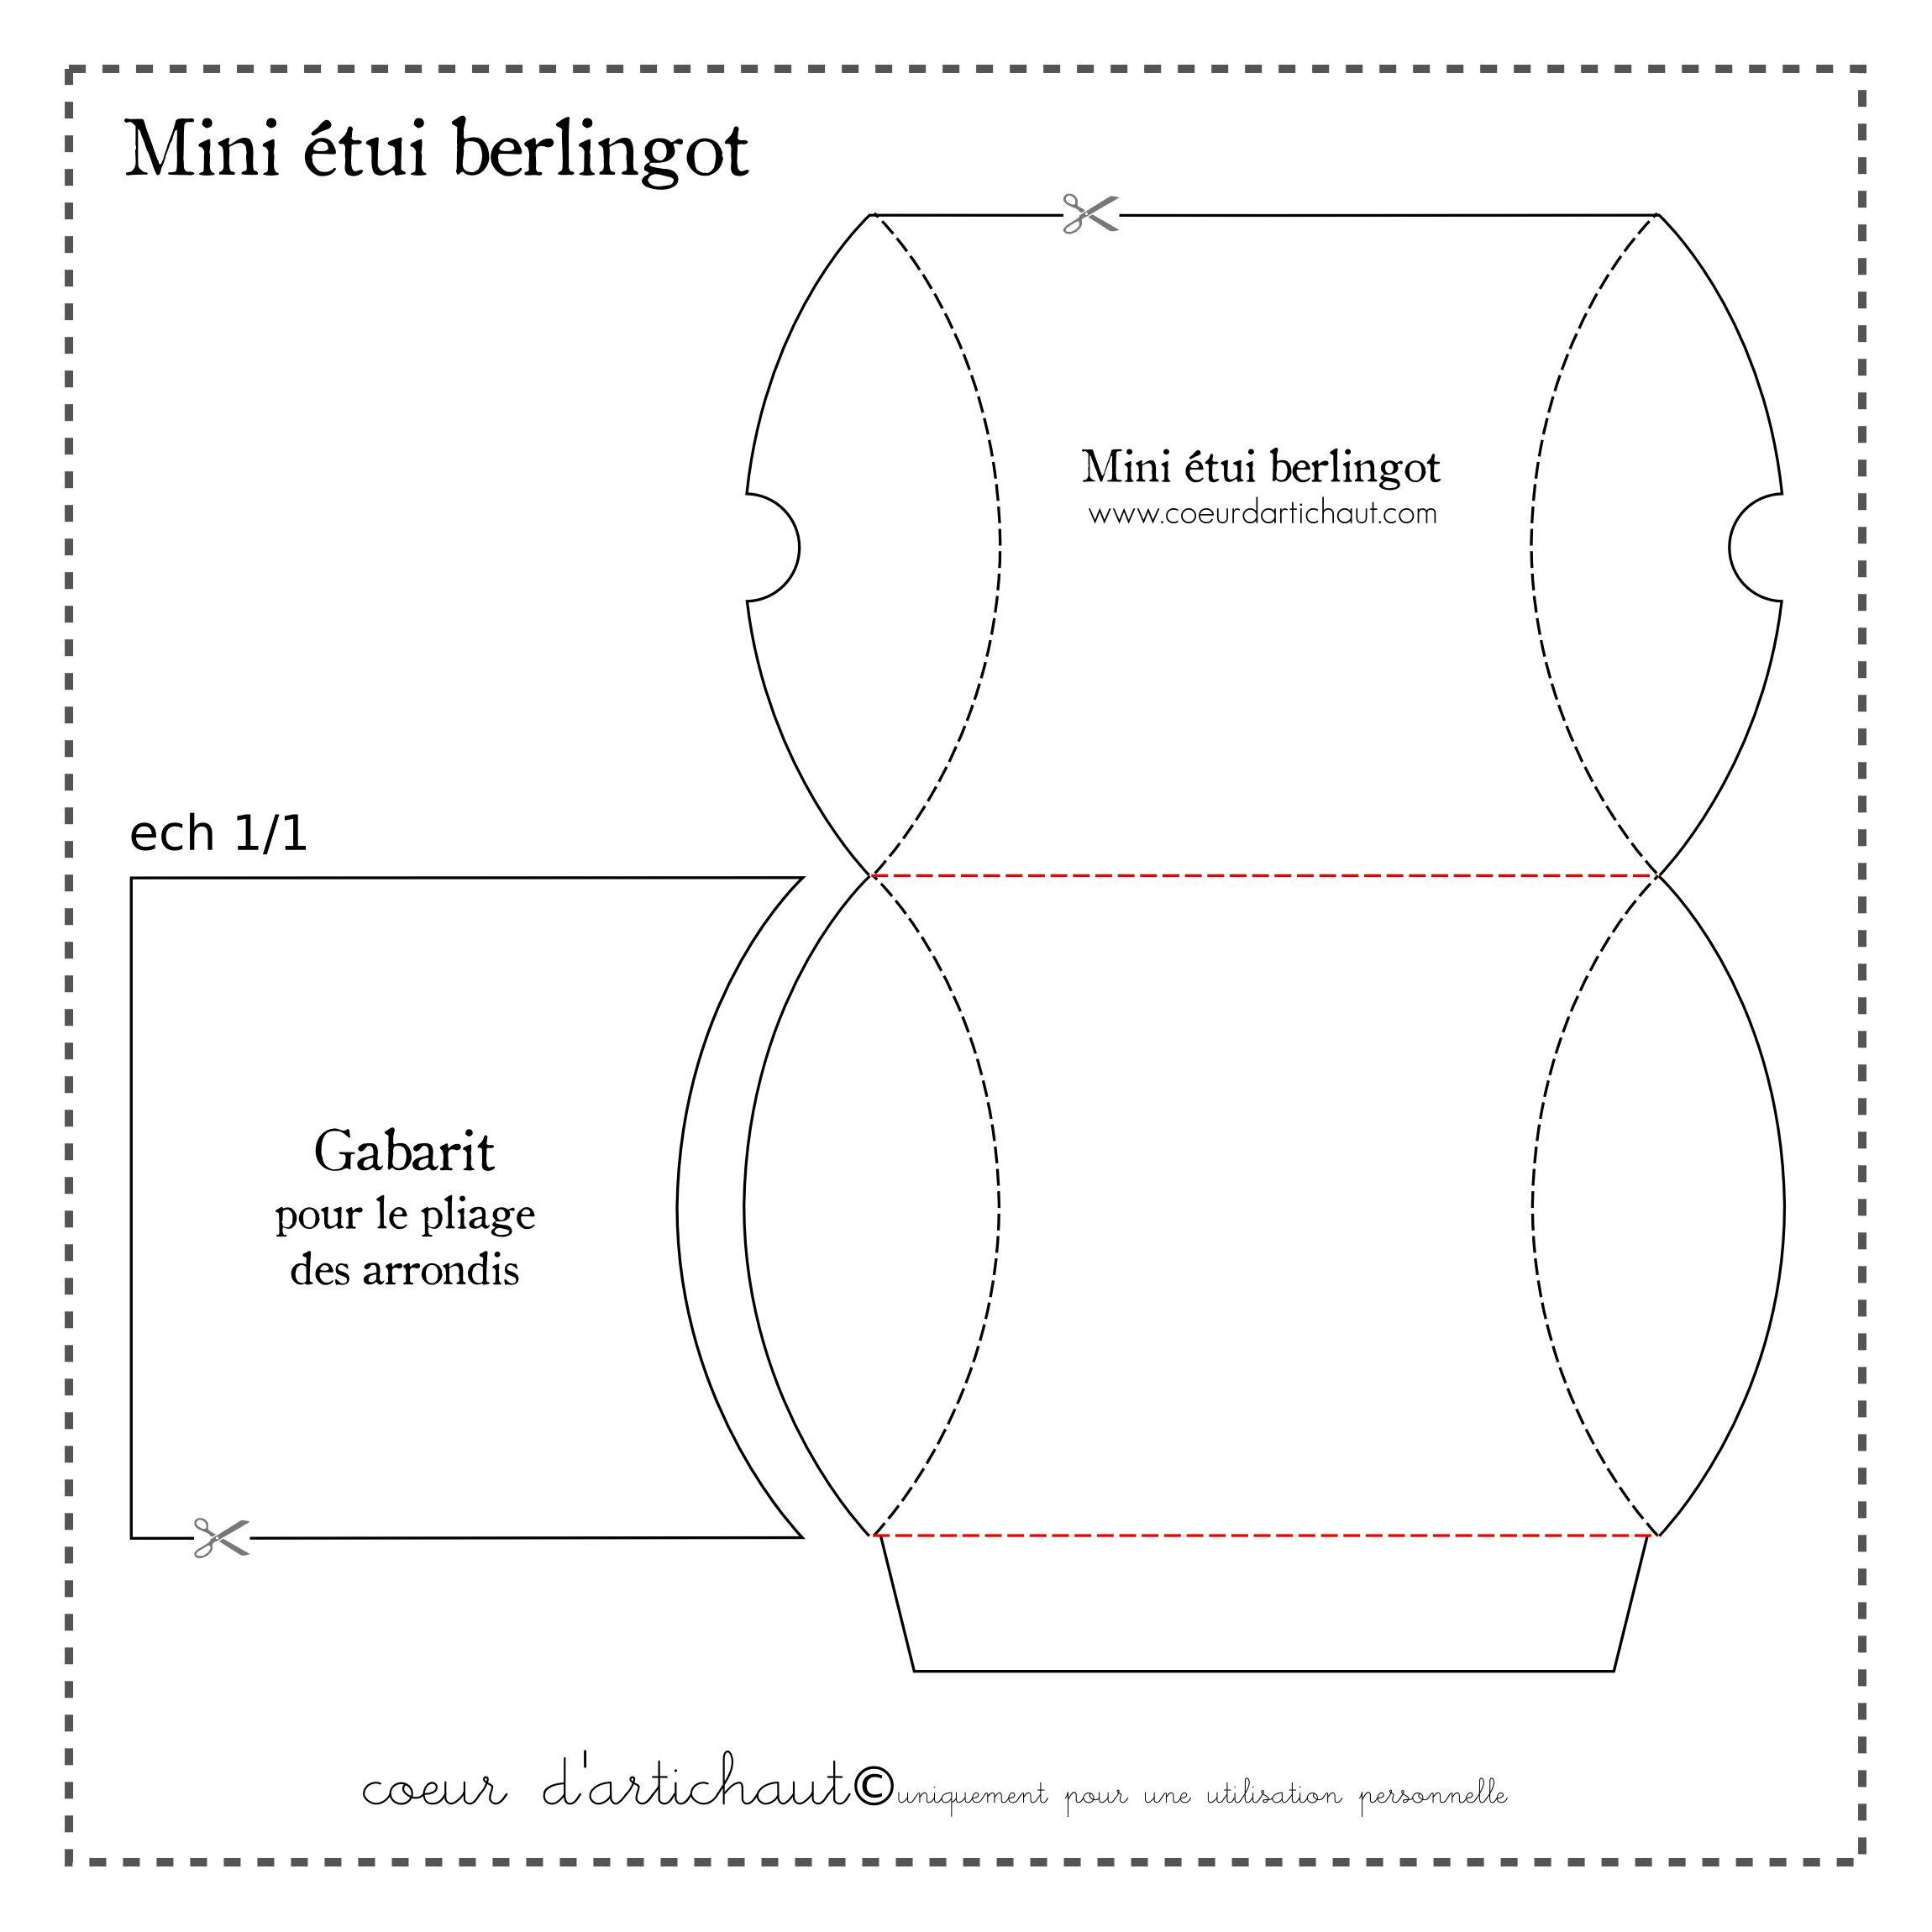 Berlingot Base | Boîtes Berlingot, Boite Cadeau, Boite Dragées avec Patron Pour Boite En Carton